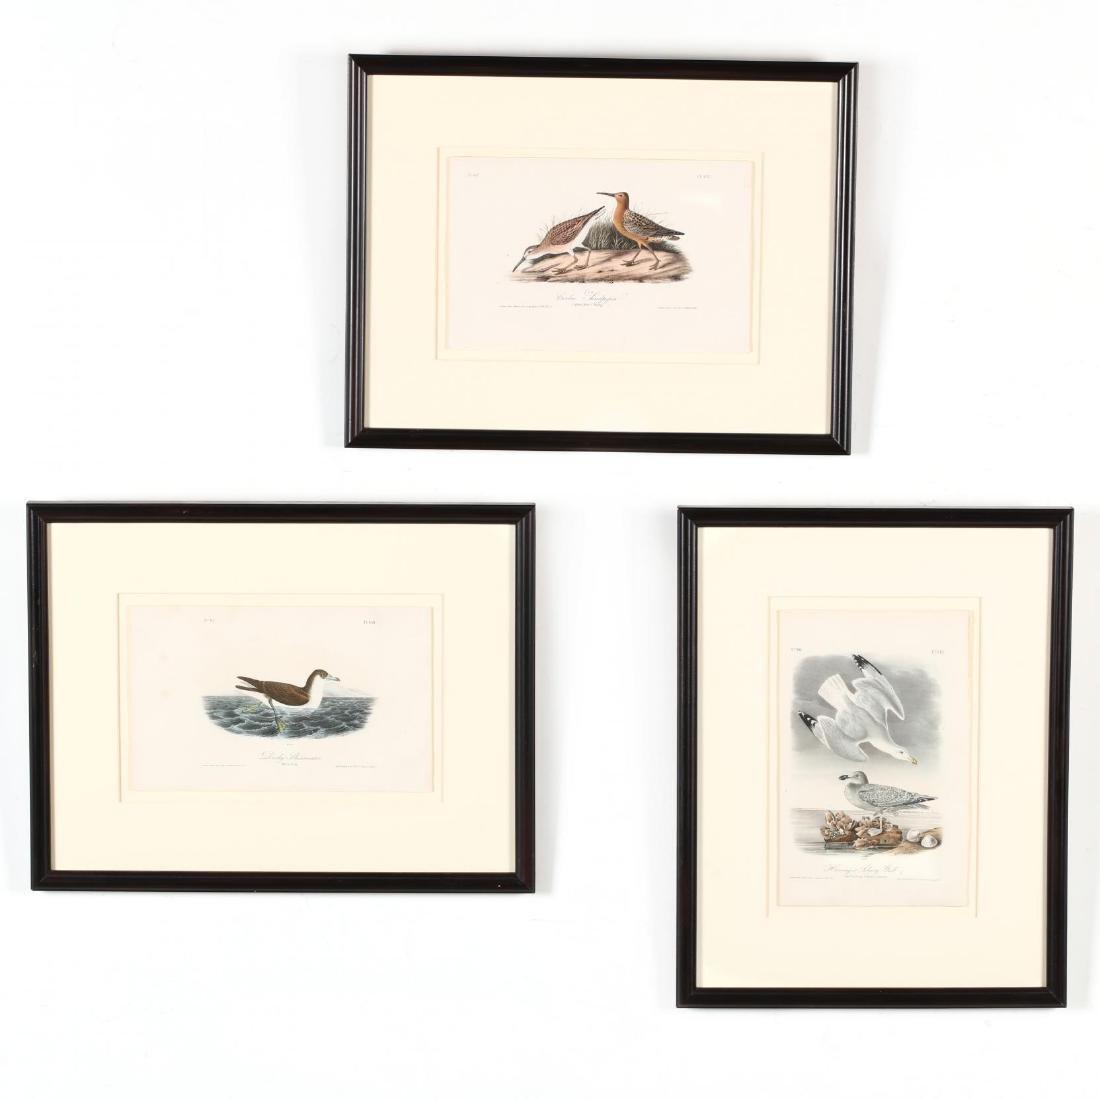 after John James Audubon (American, 1785-1851), Three